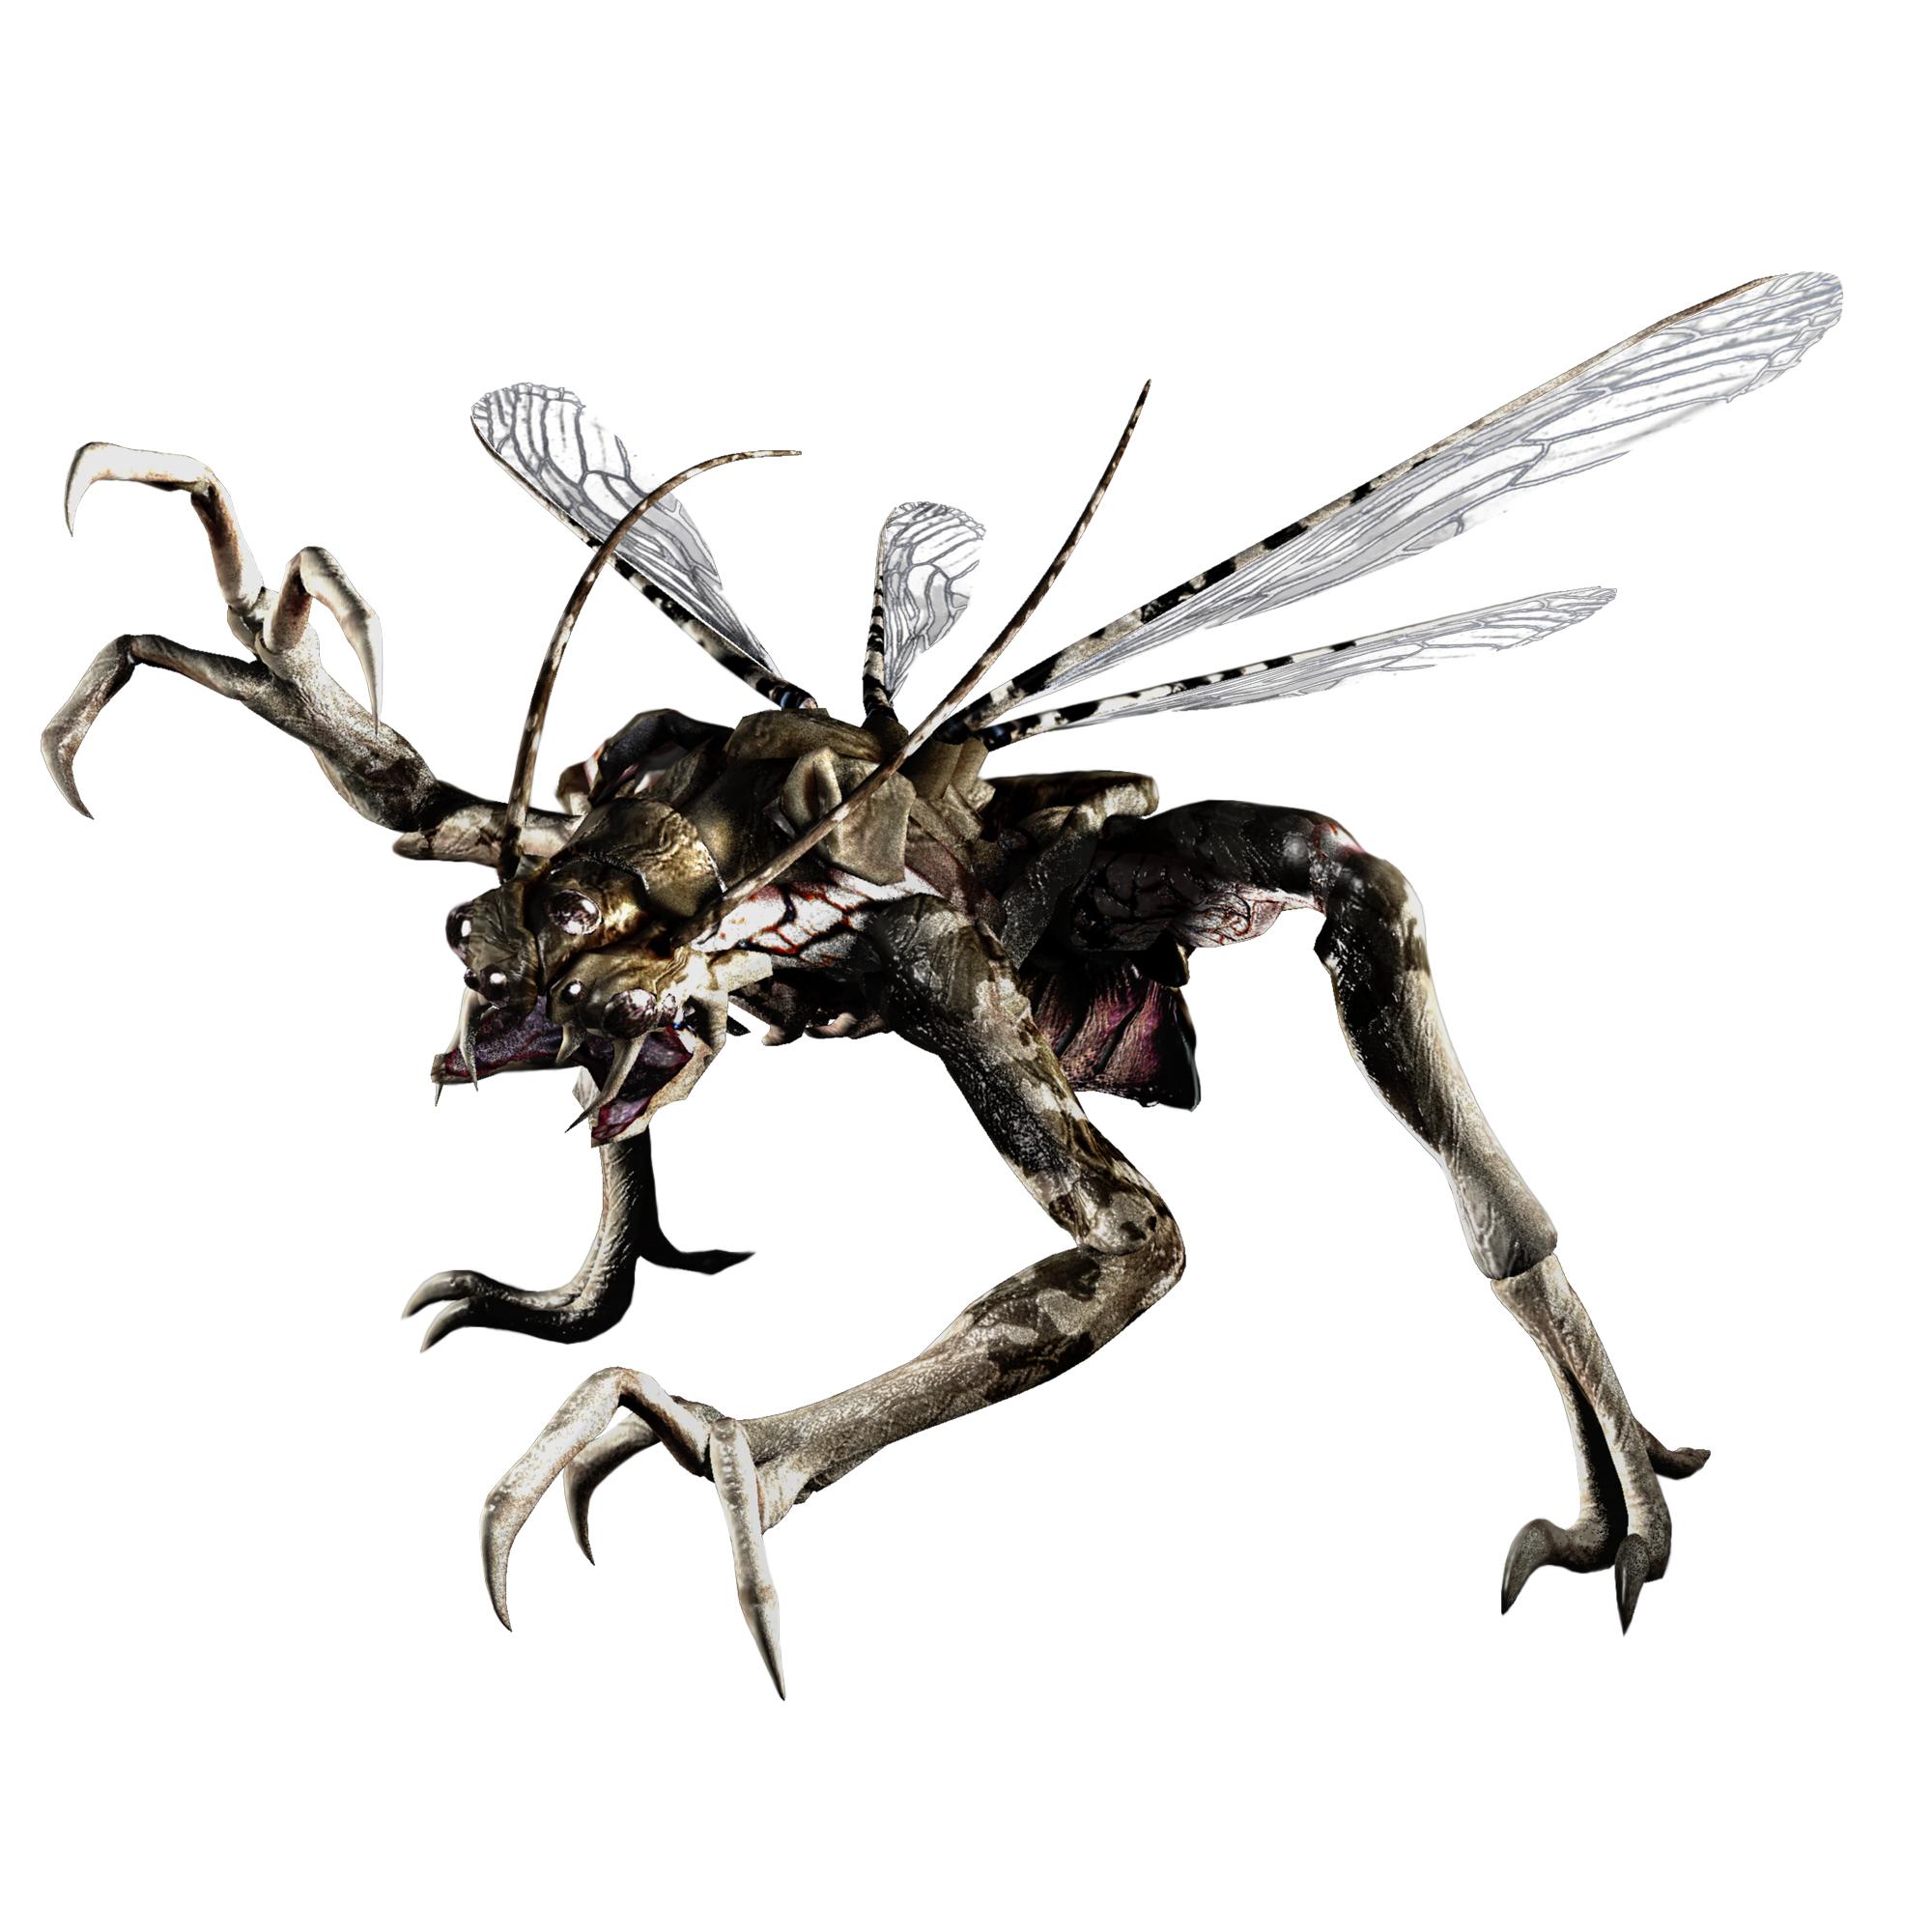 resident-evil-4-artwork-novistador-flying-insect